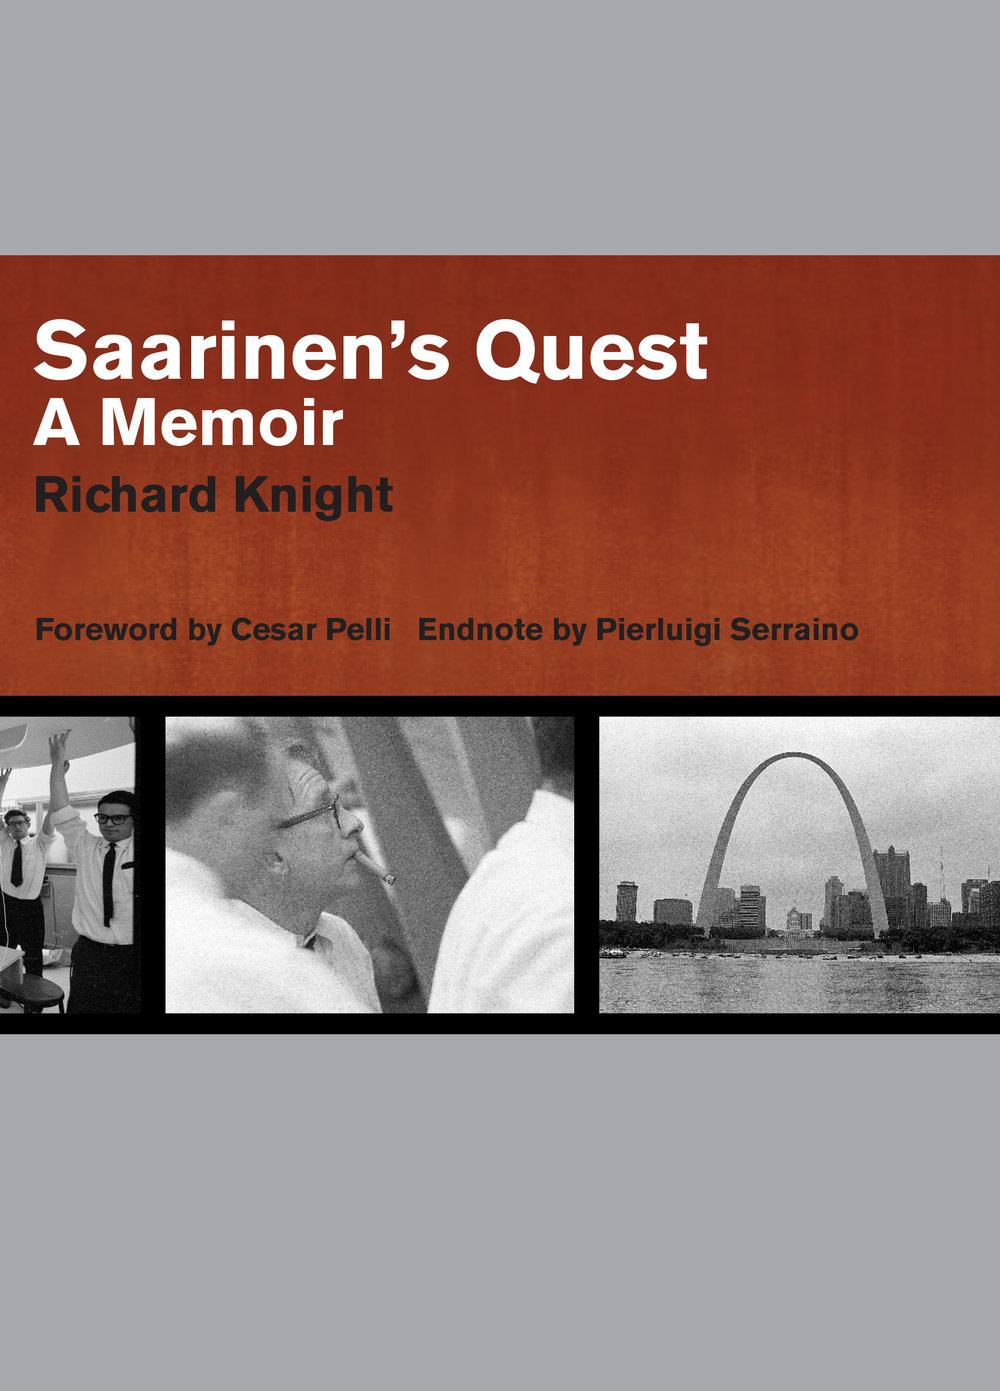 Saarinen's Quest: A Memoir